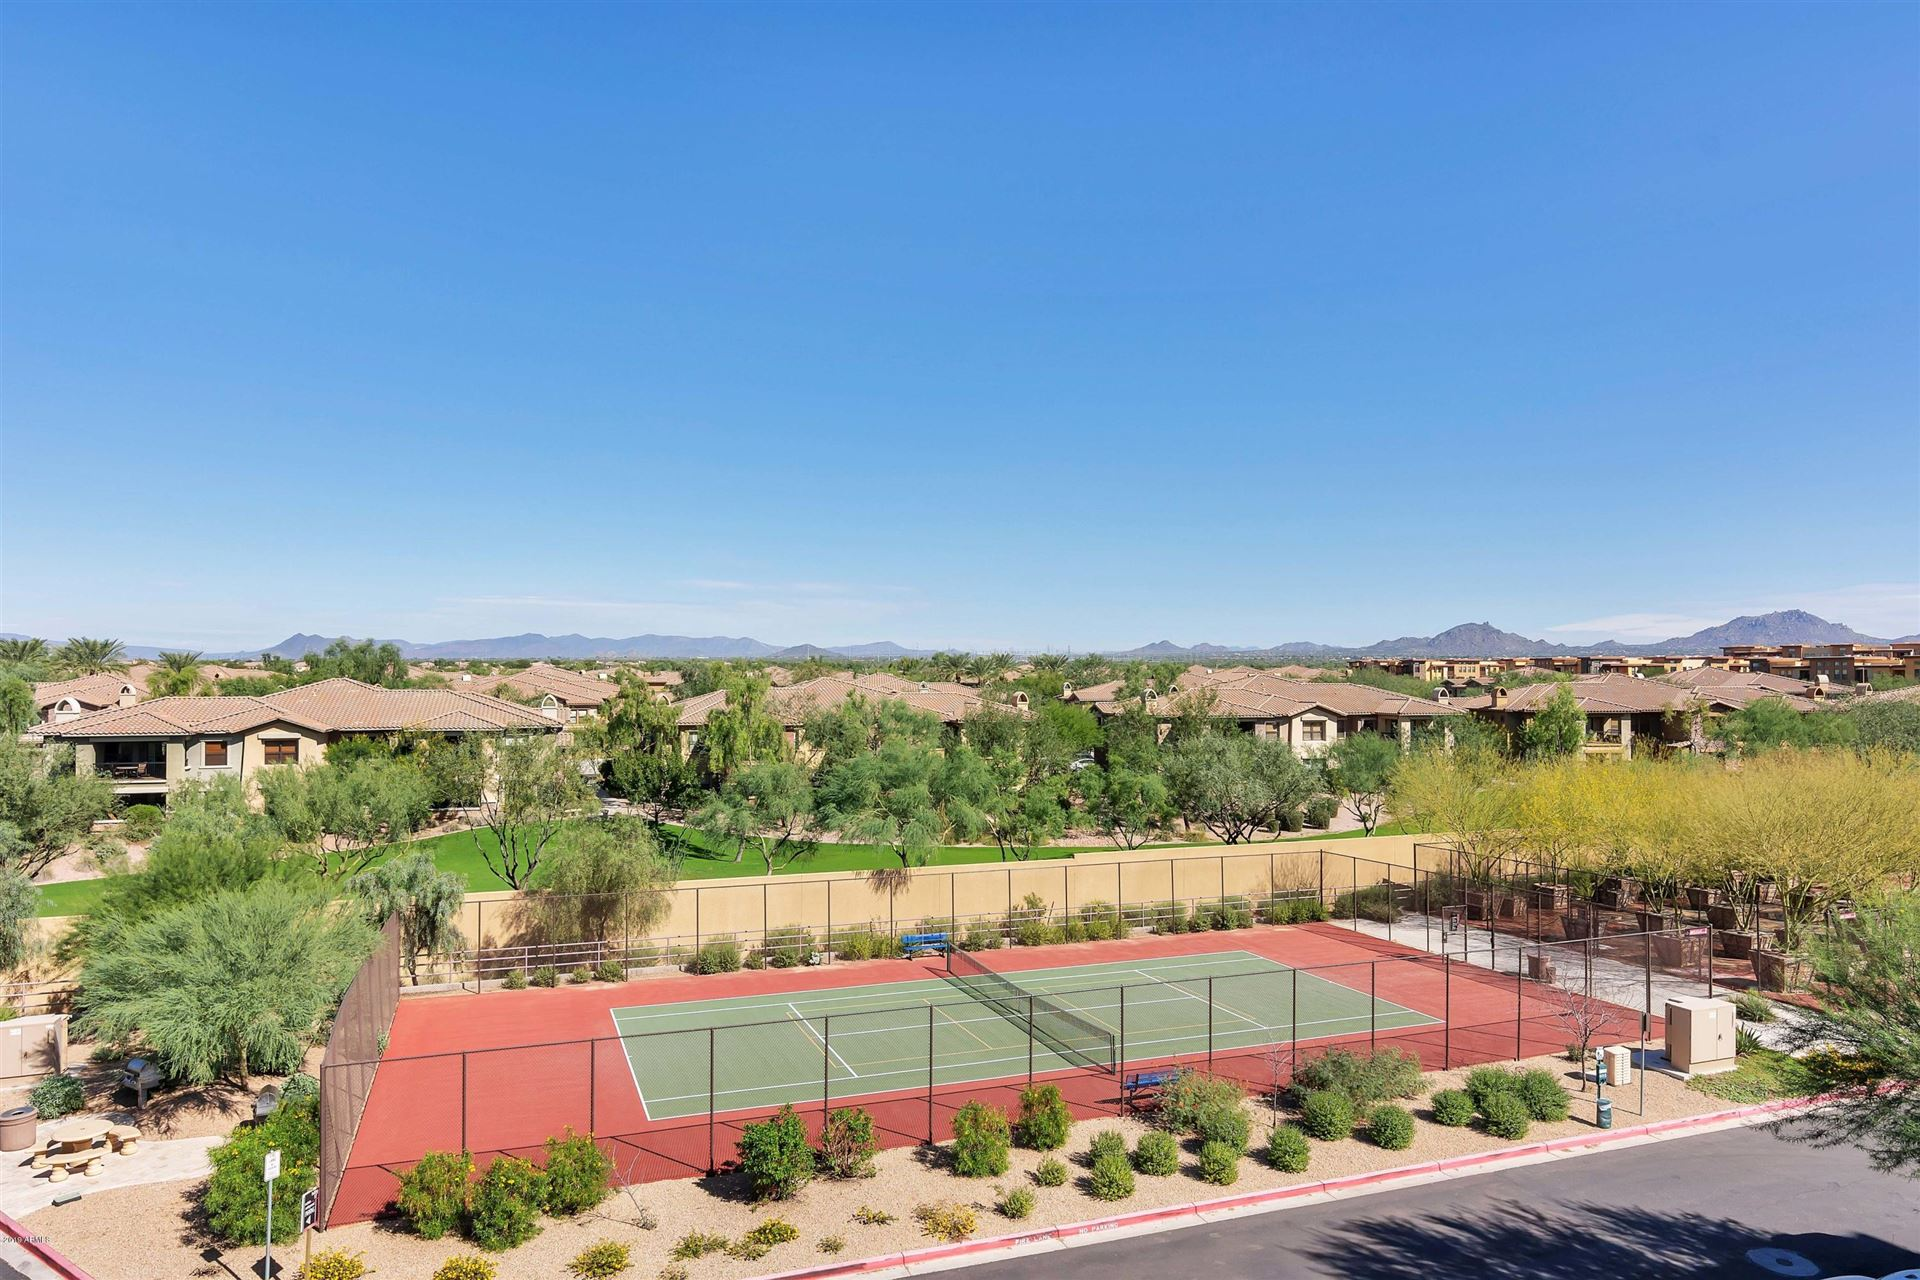 5450 E DEER VALLEY Drive #4177, Phoenix, AZ 85054 - MLS#: 6008600